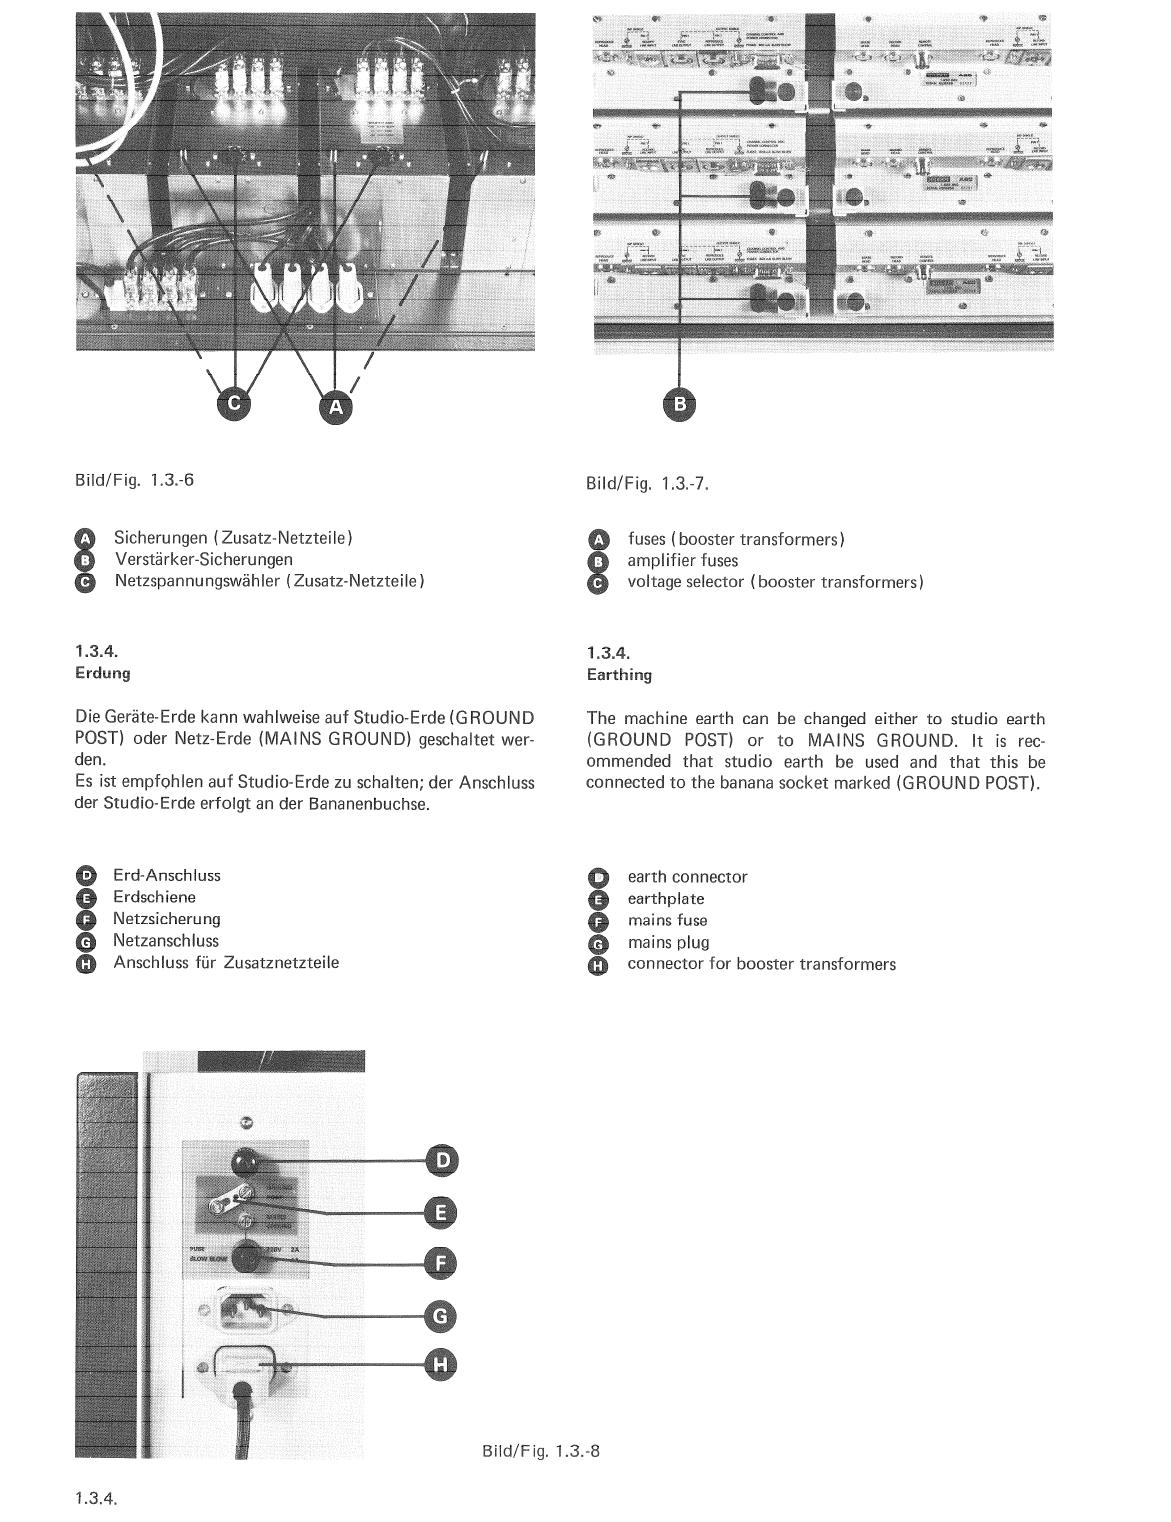 Wunderbar Standard Drahtfarben Fotos - Elektrische Schaltplan-Ideen ...